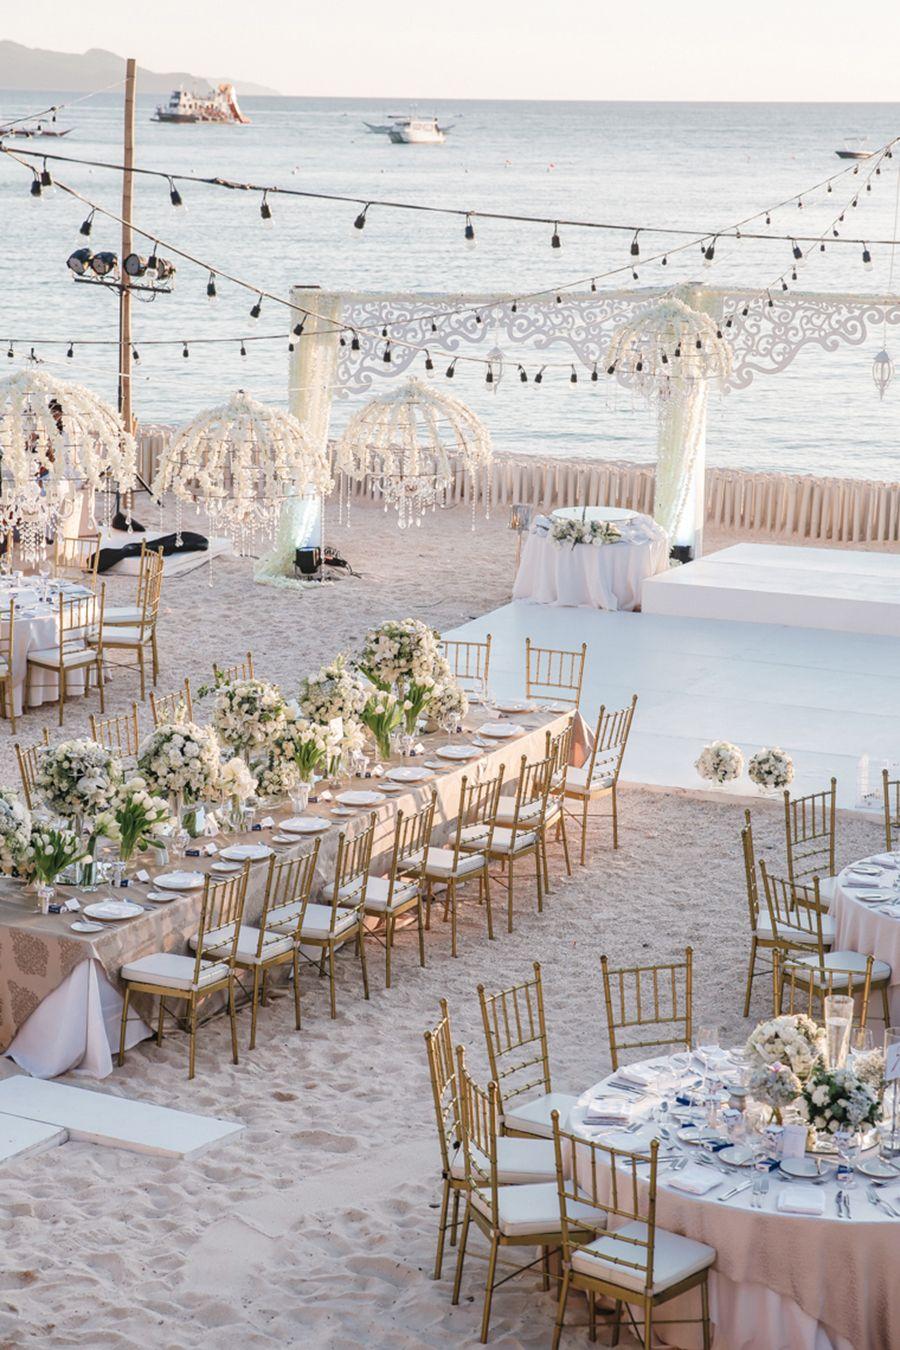 Matt and Katy's Destination Wedding at Shangri-La's Boracay Resort ...